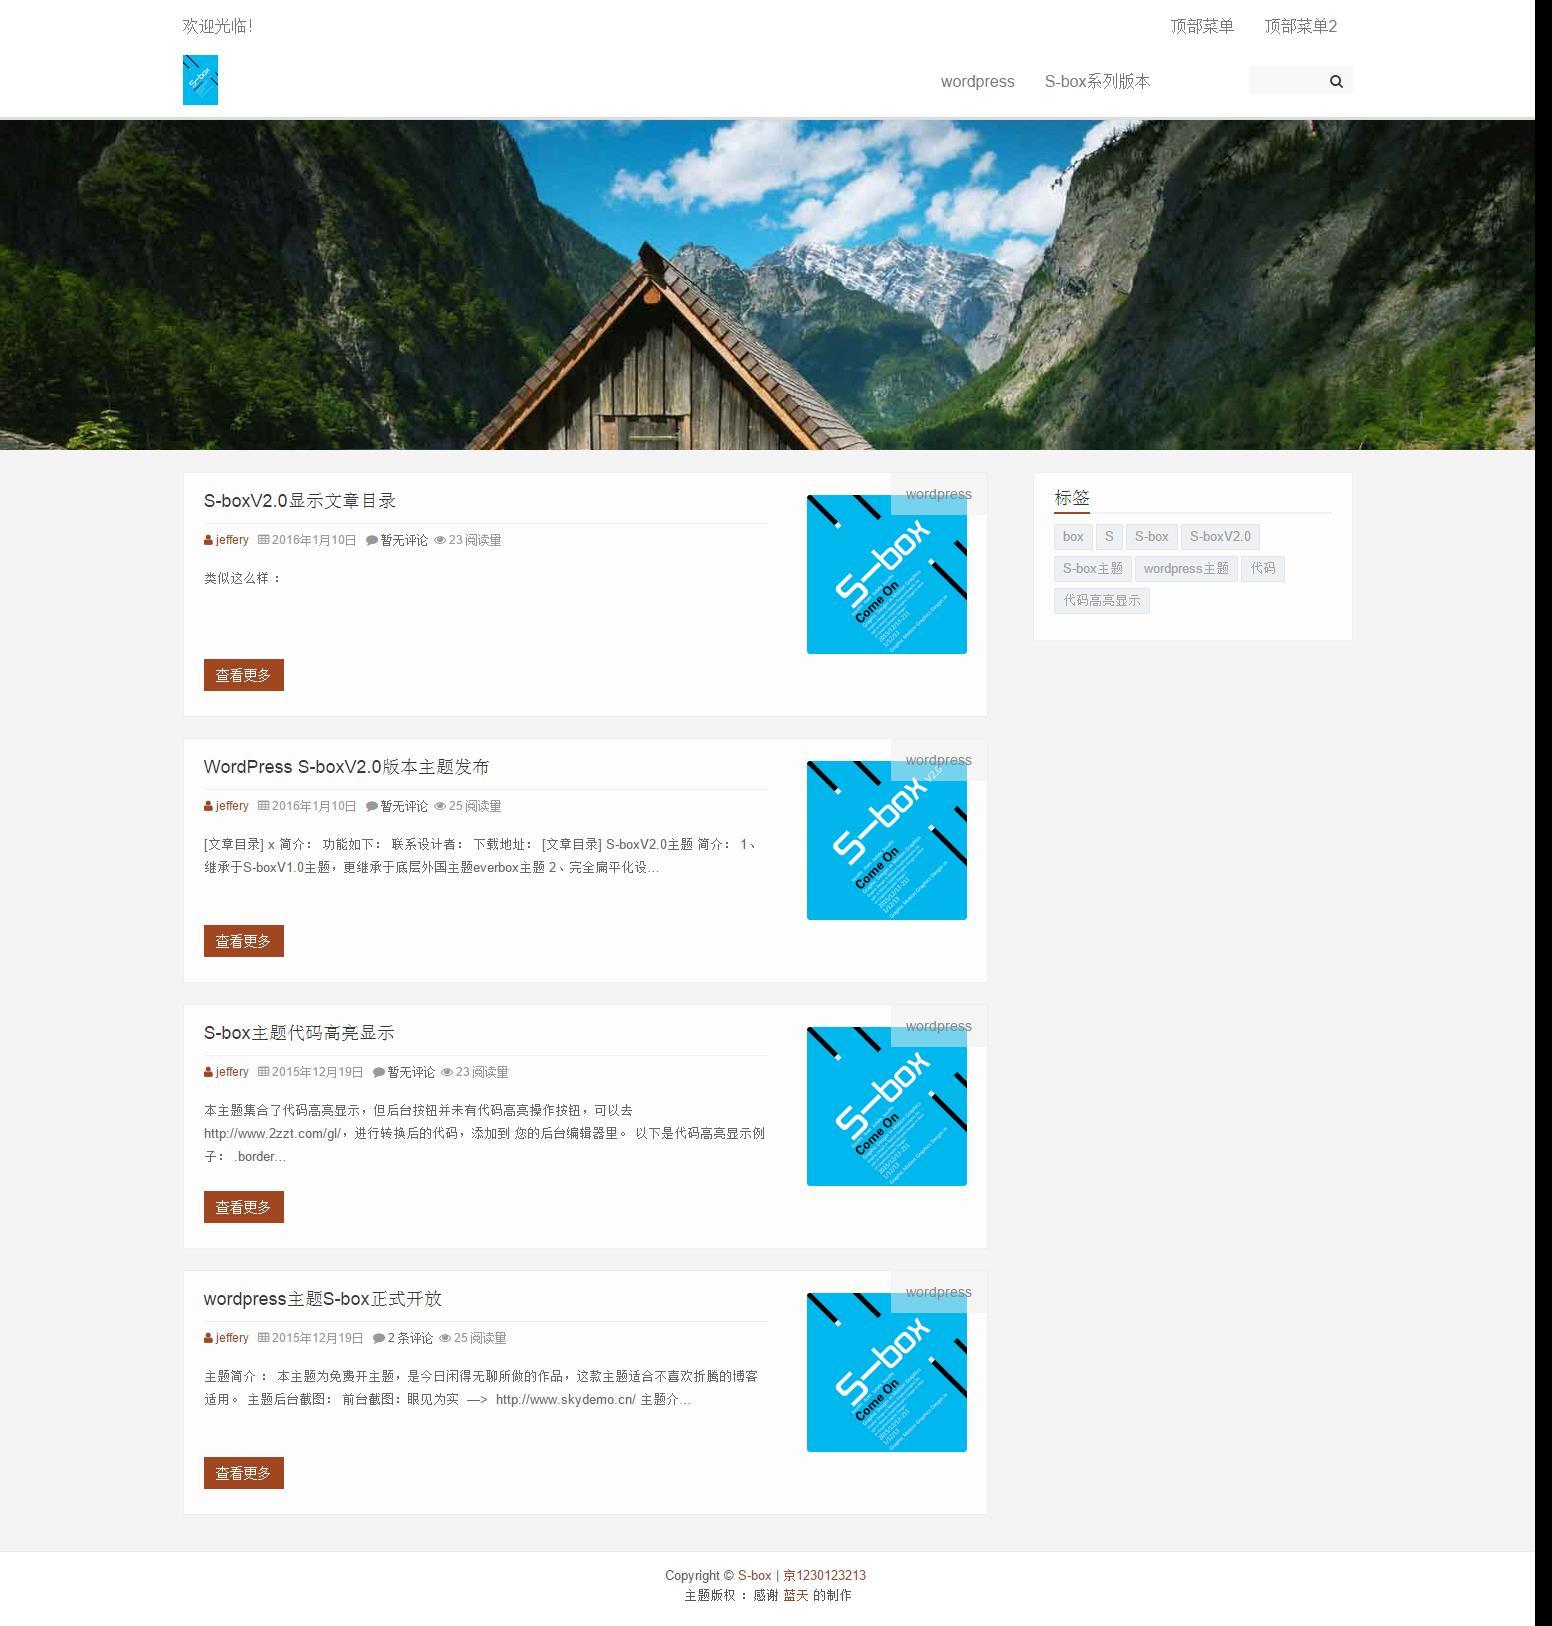 WordPress S-boxV2.0版本主题发布